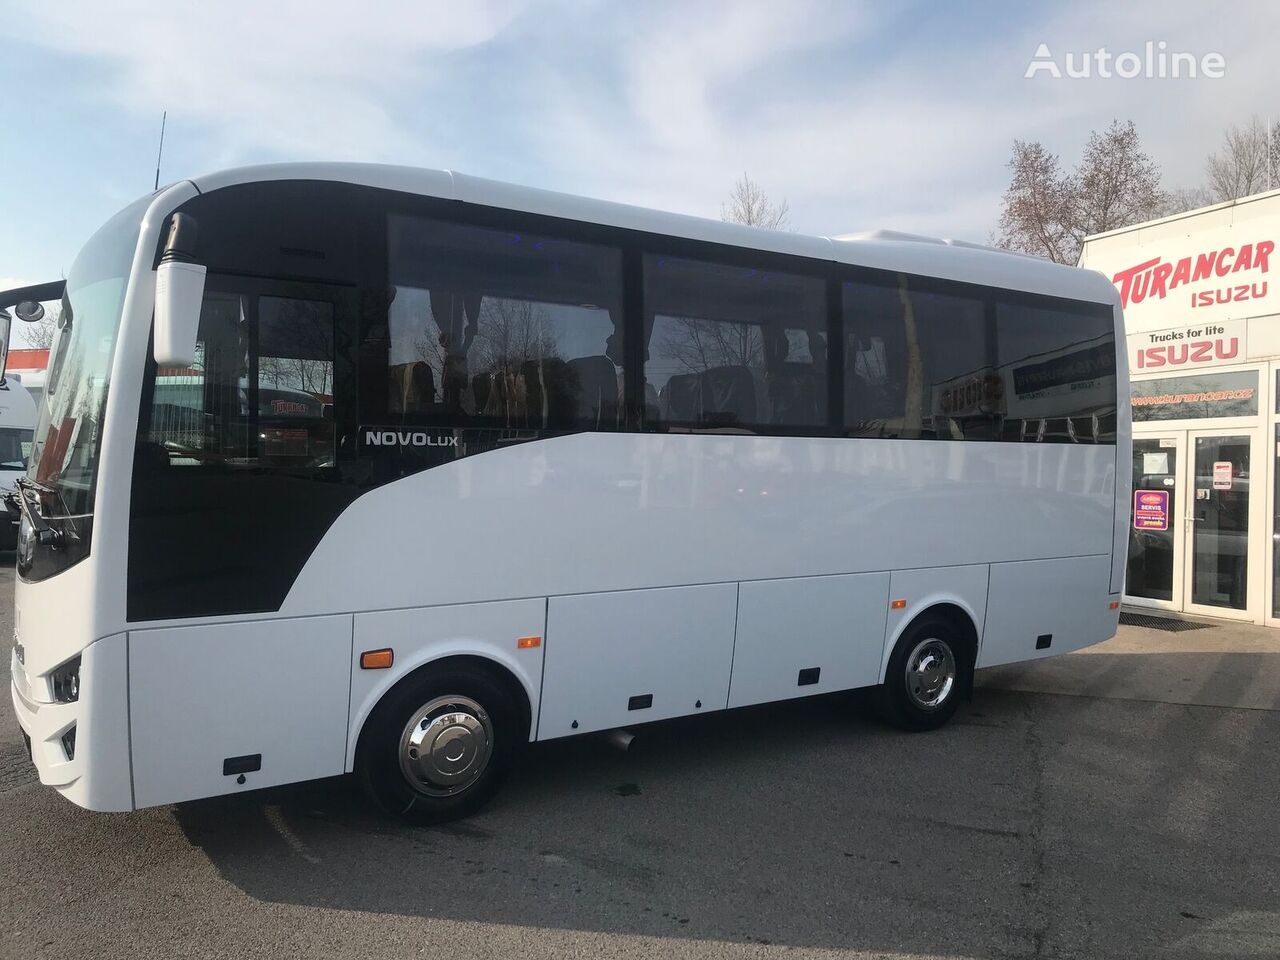 autobús de turismo ISUZU Novo LUX S 801 - 2 LDWS nuevo